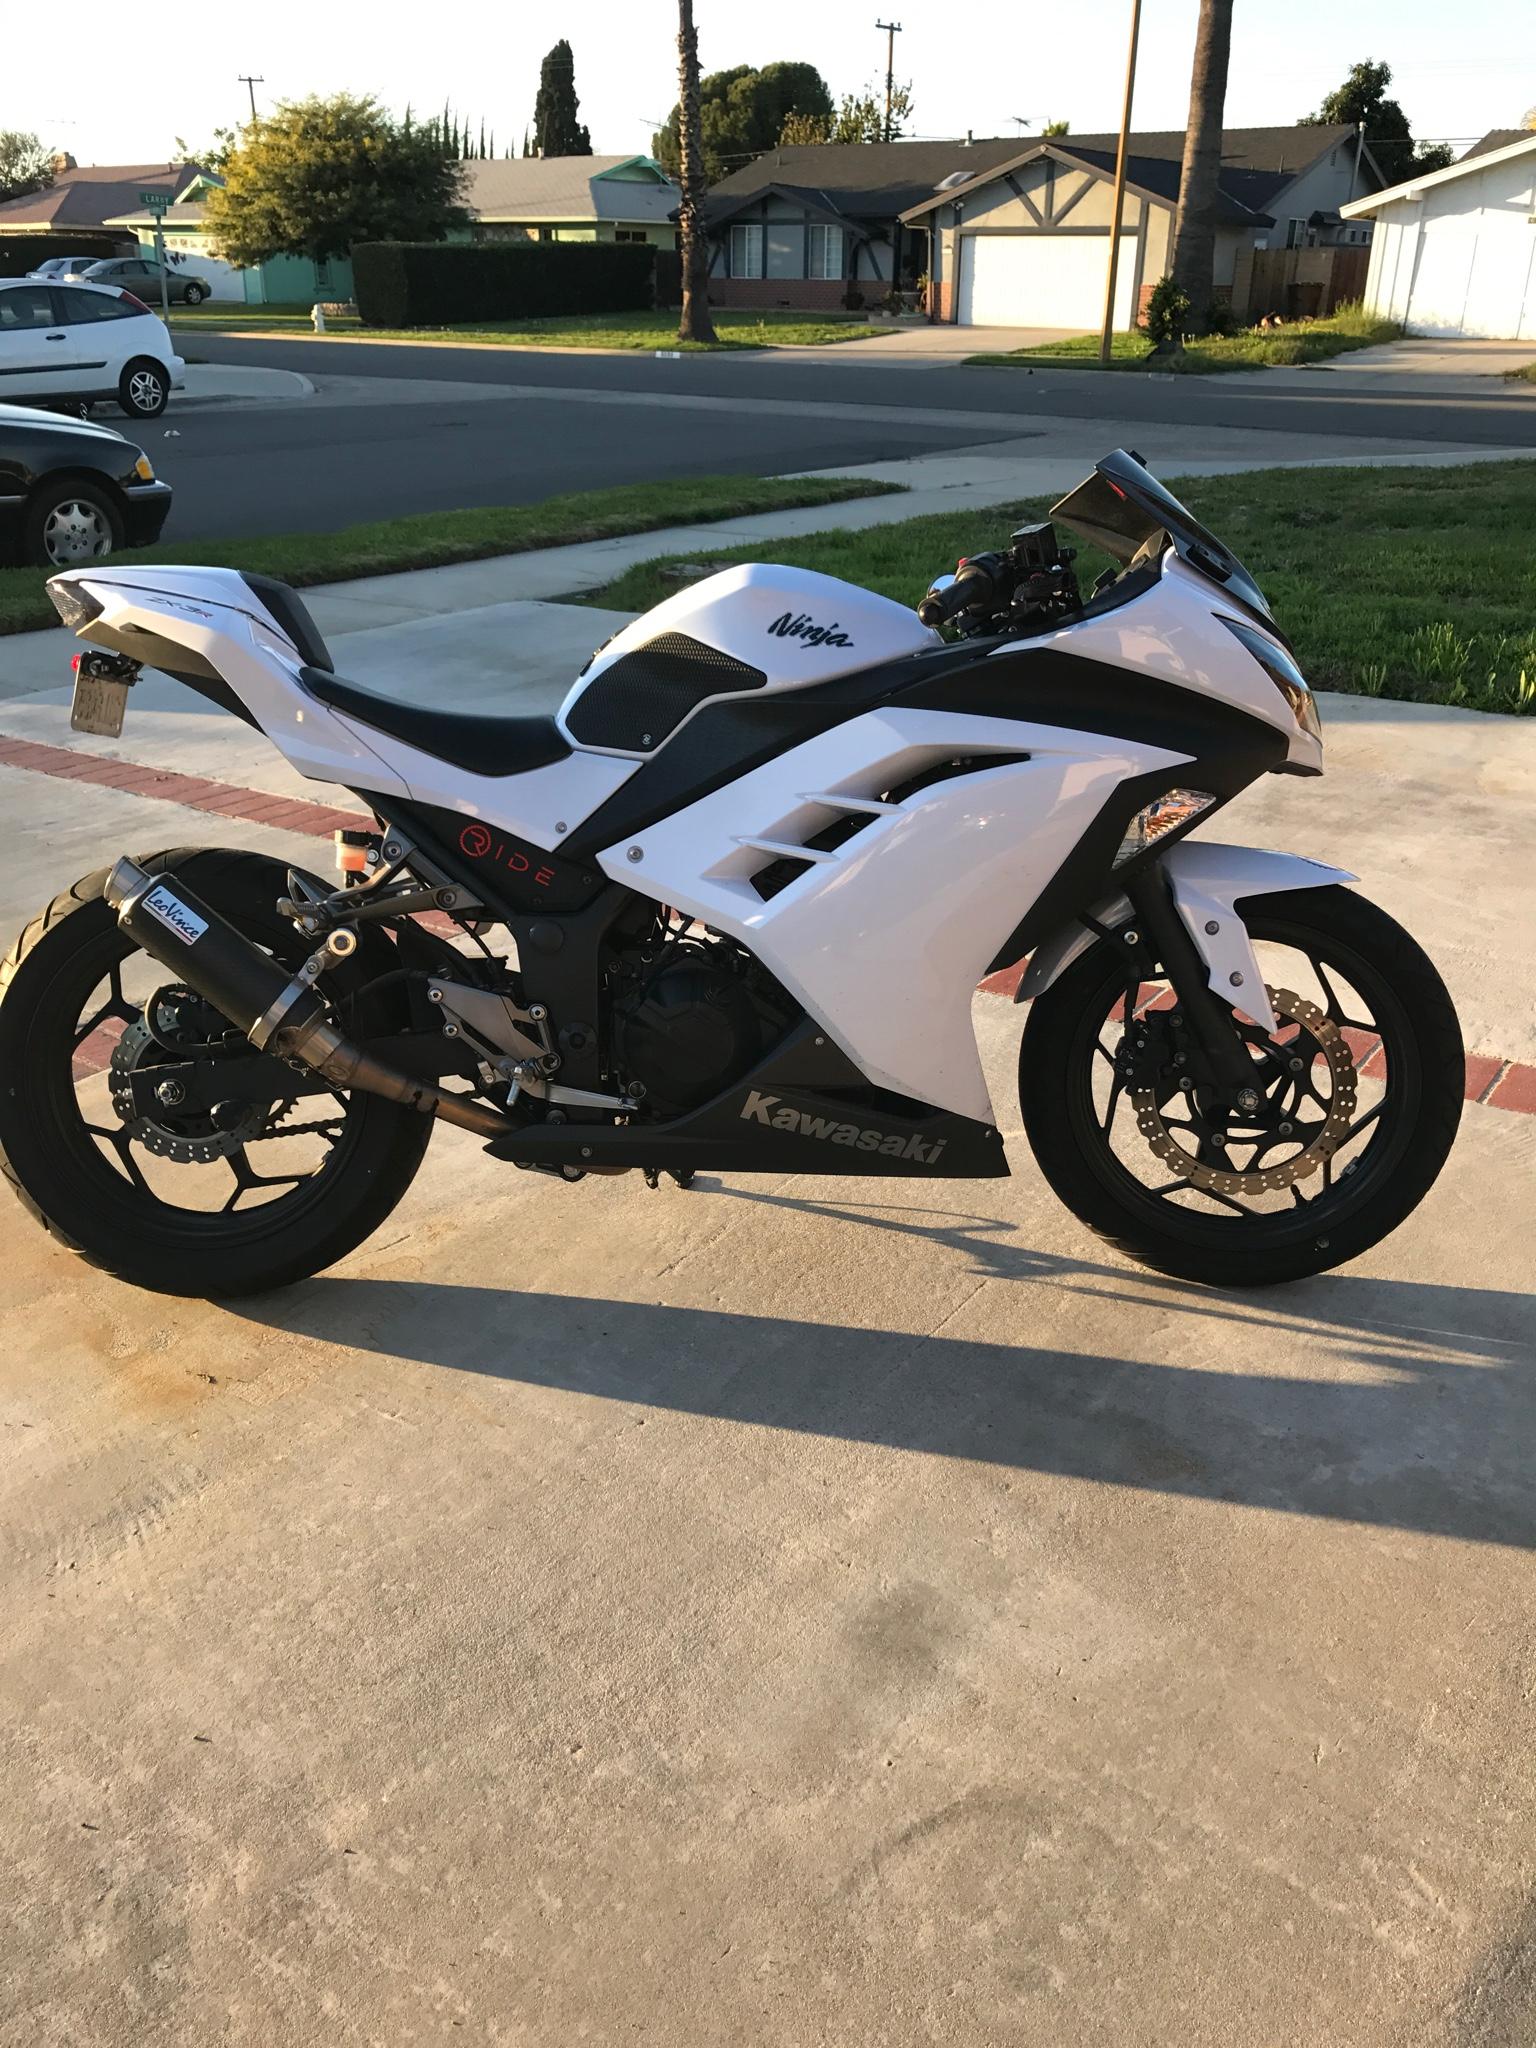 Official pearl stardust white kawasaki ninja 300 picture thread page 47 kawasaki ninja 300 forum - Ninja 300 forum ...